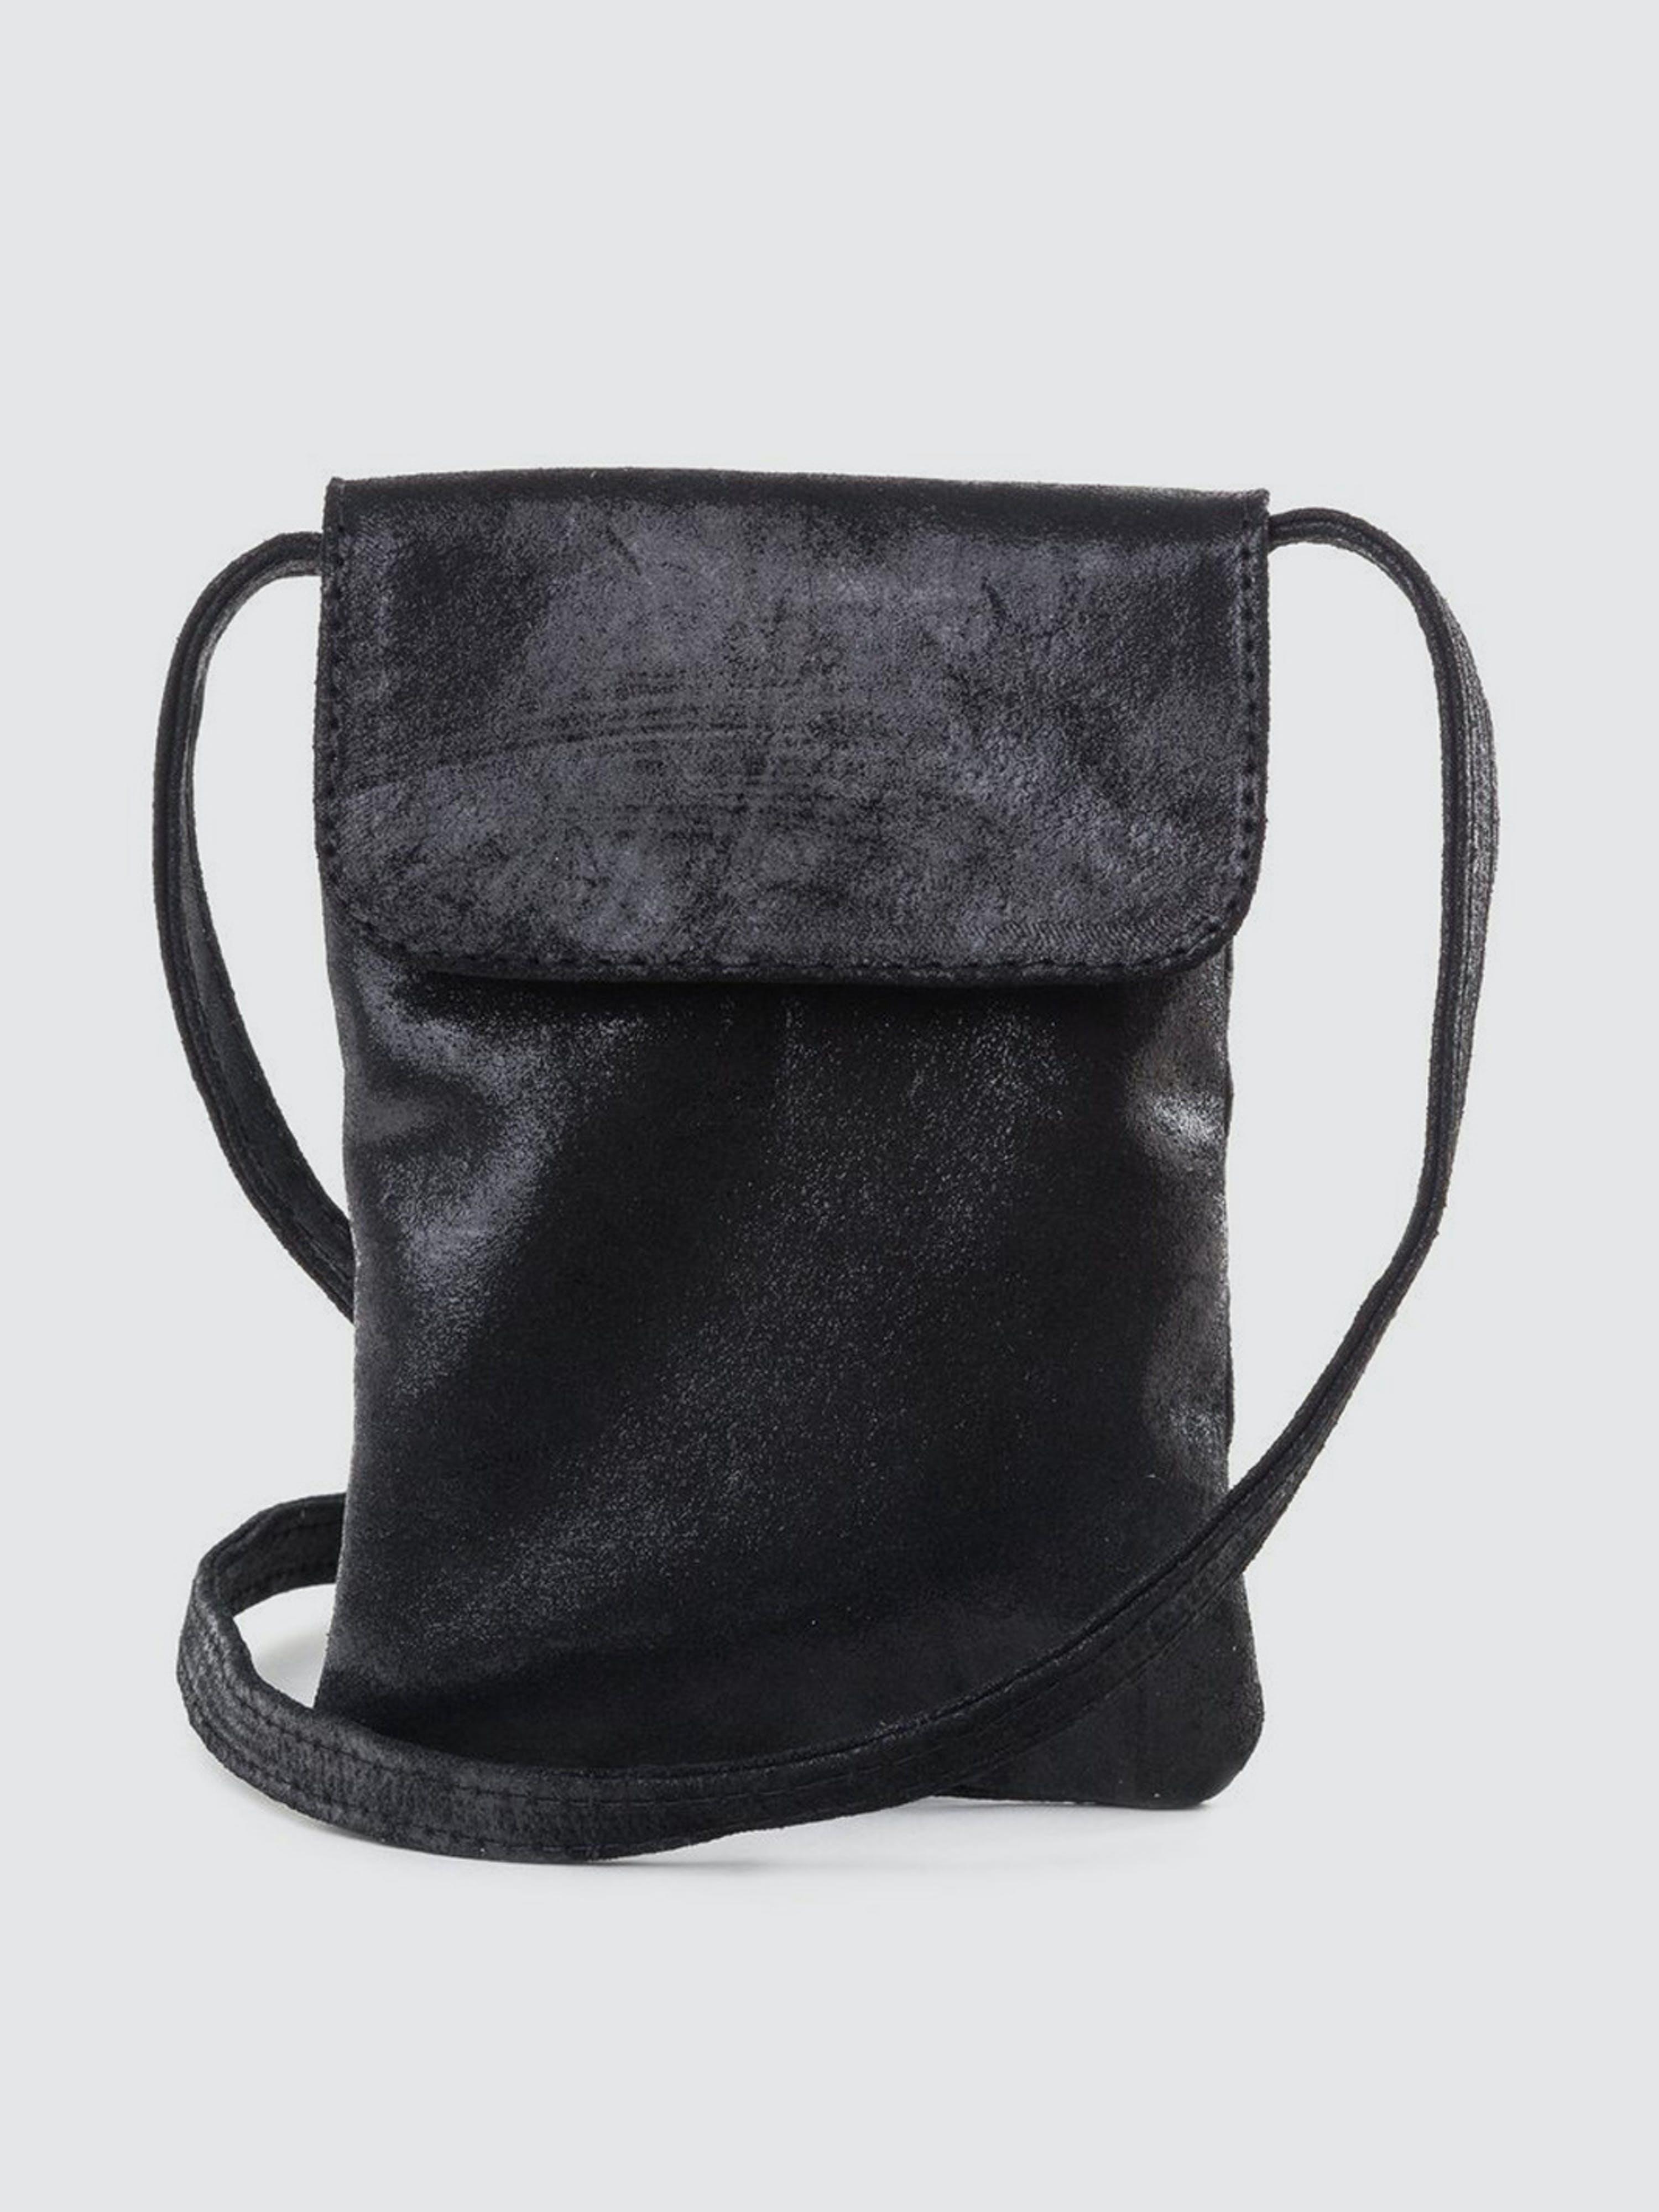 CoFi Leathers Penny Phone Bag: Black  - Black